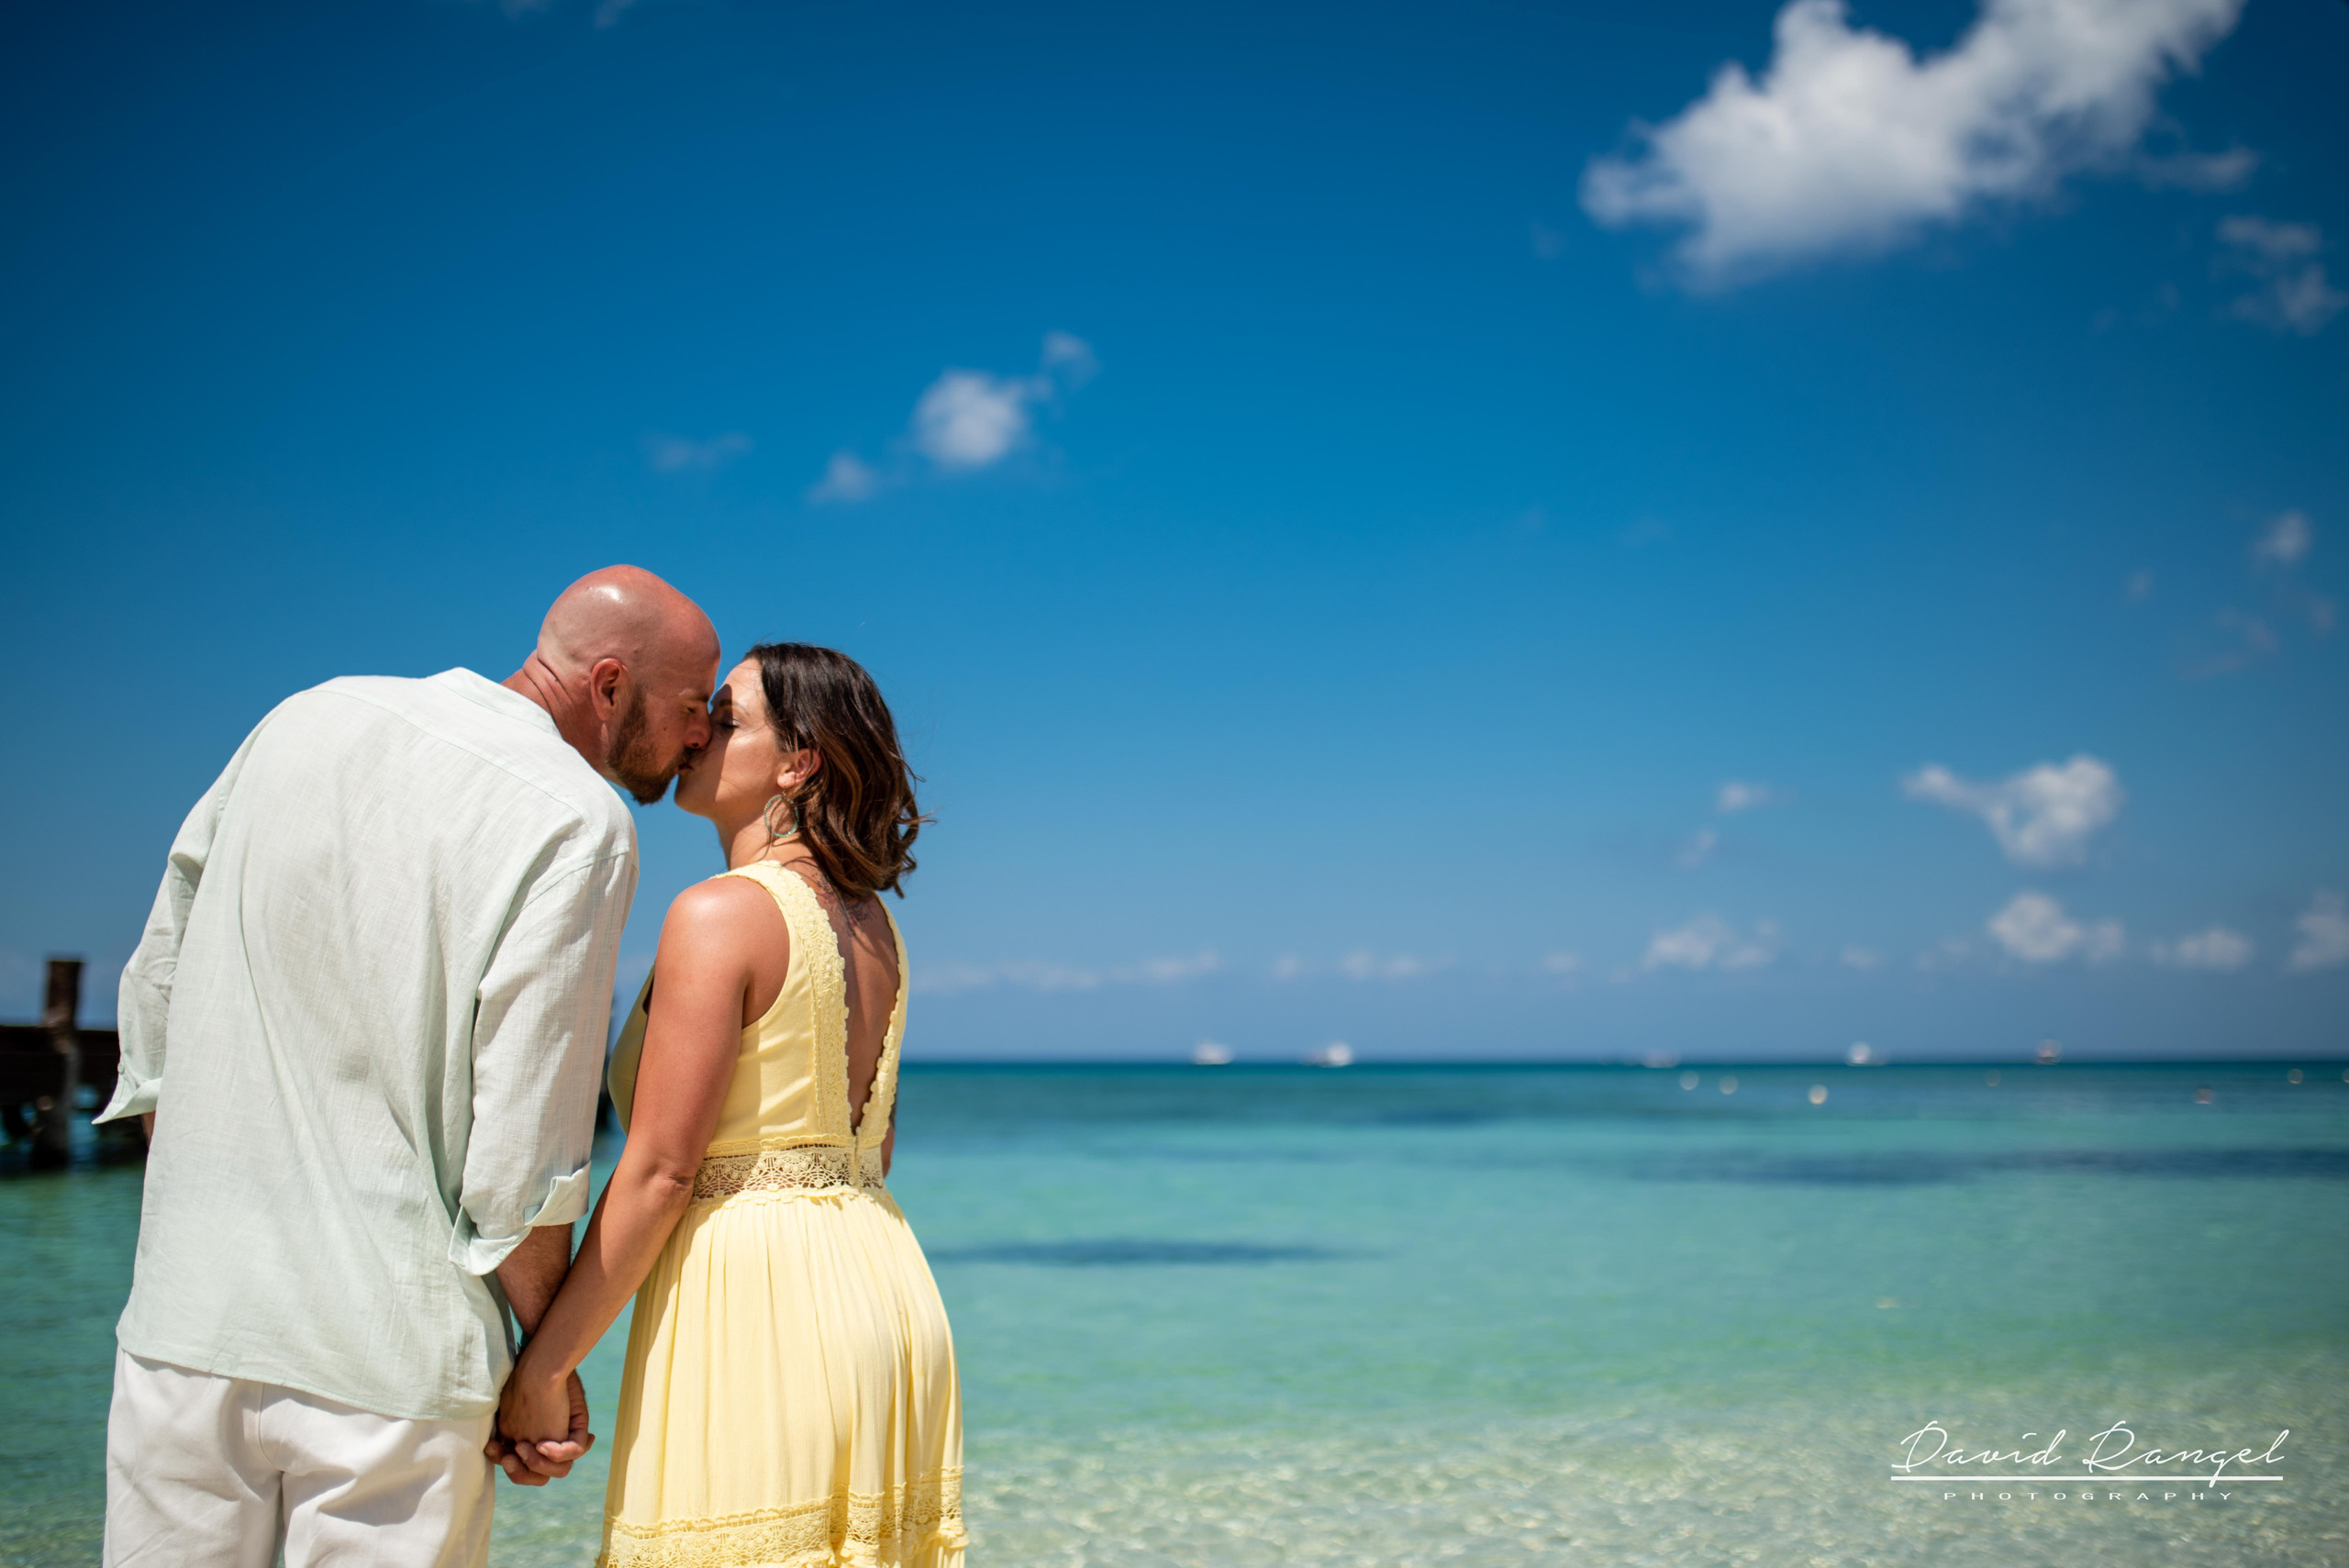 sand+session+beach+cozumel+island+photo+destination+photographer+couple+romantic+water+pier+paradise+happy+kiss